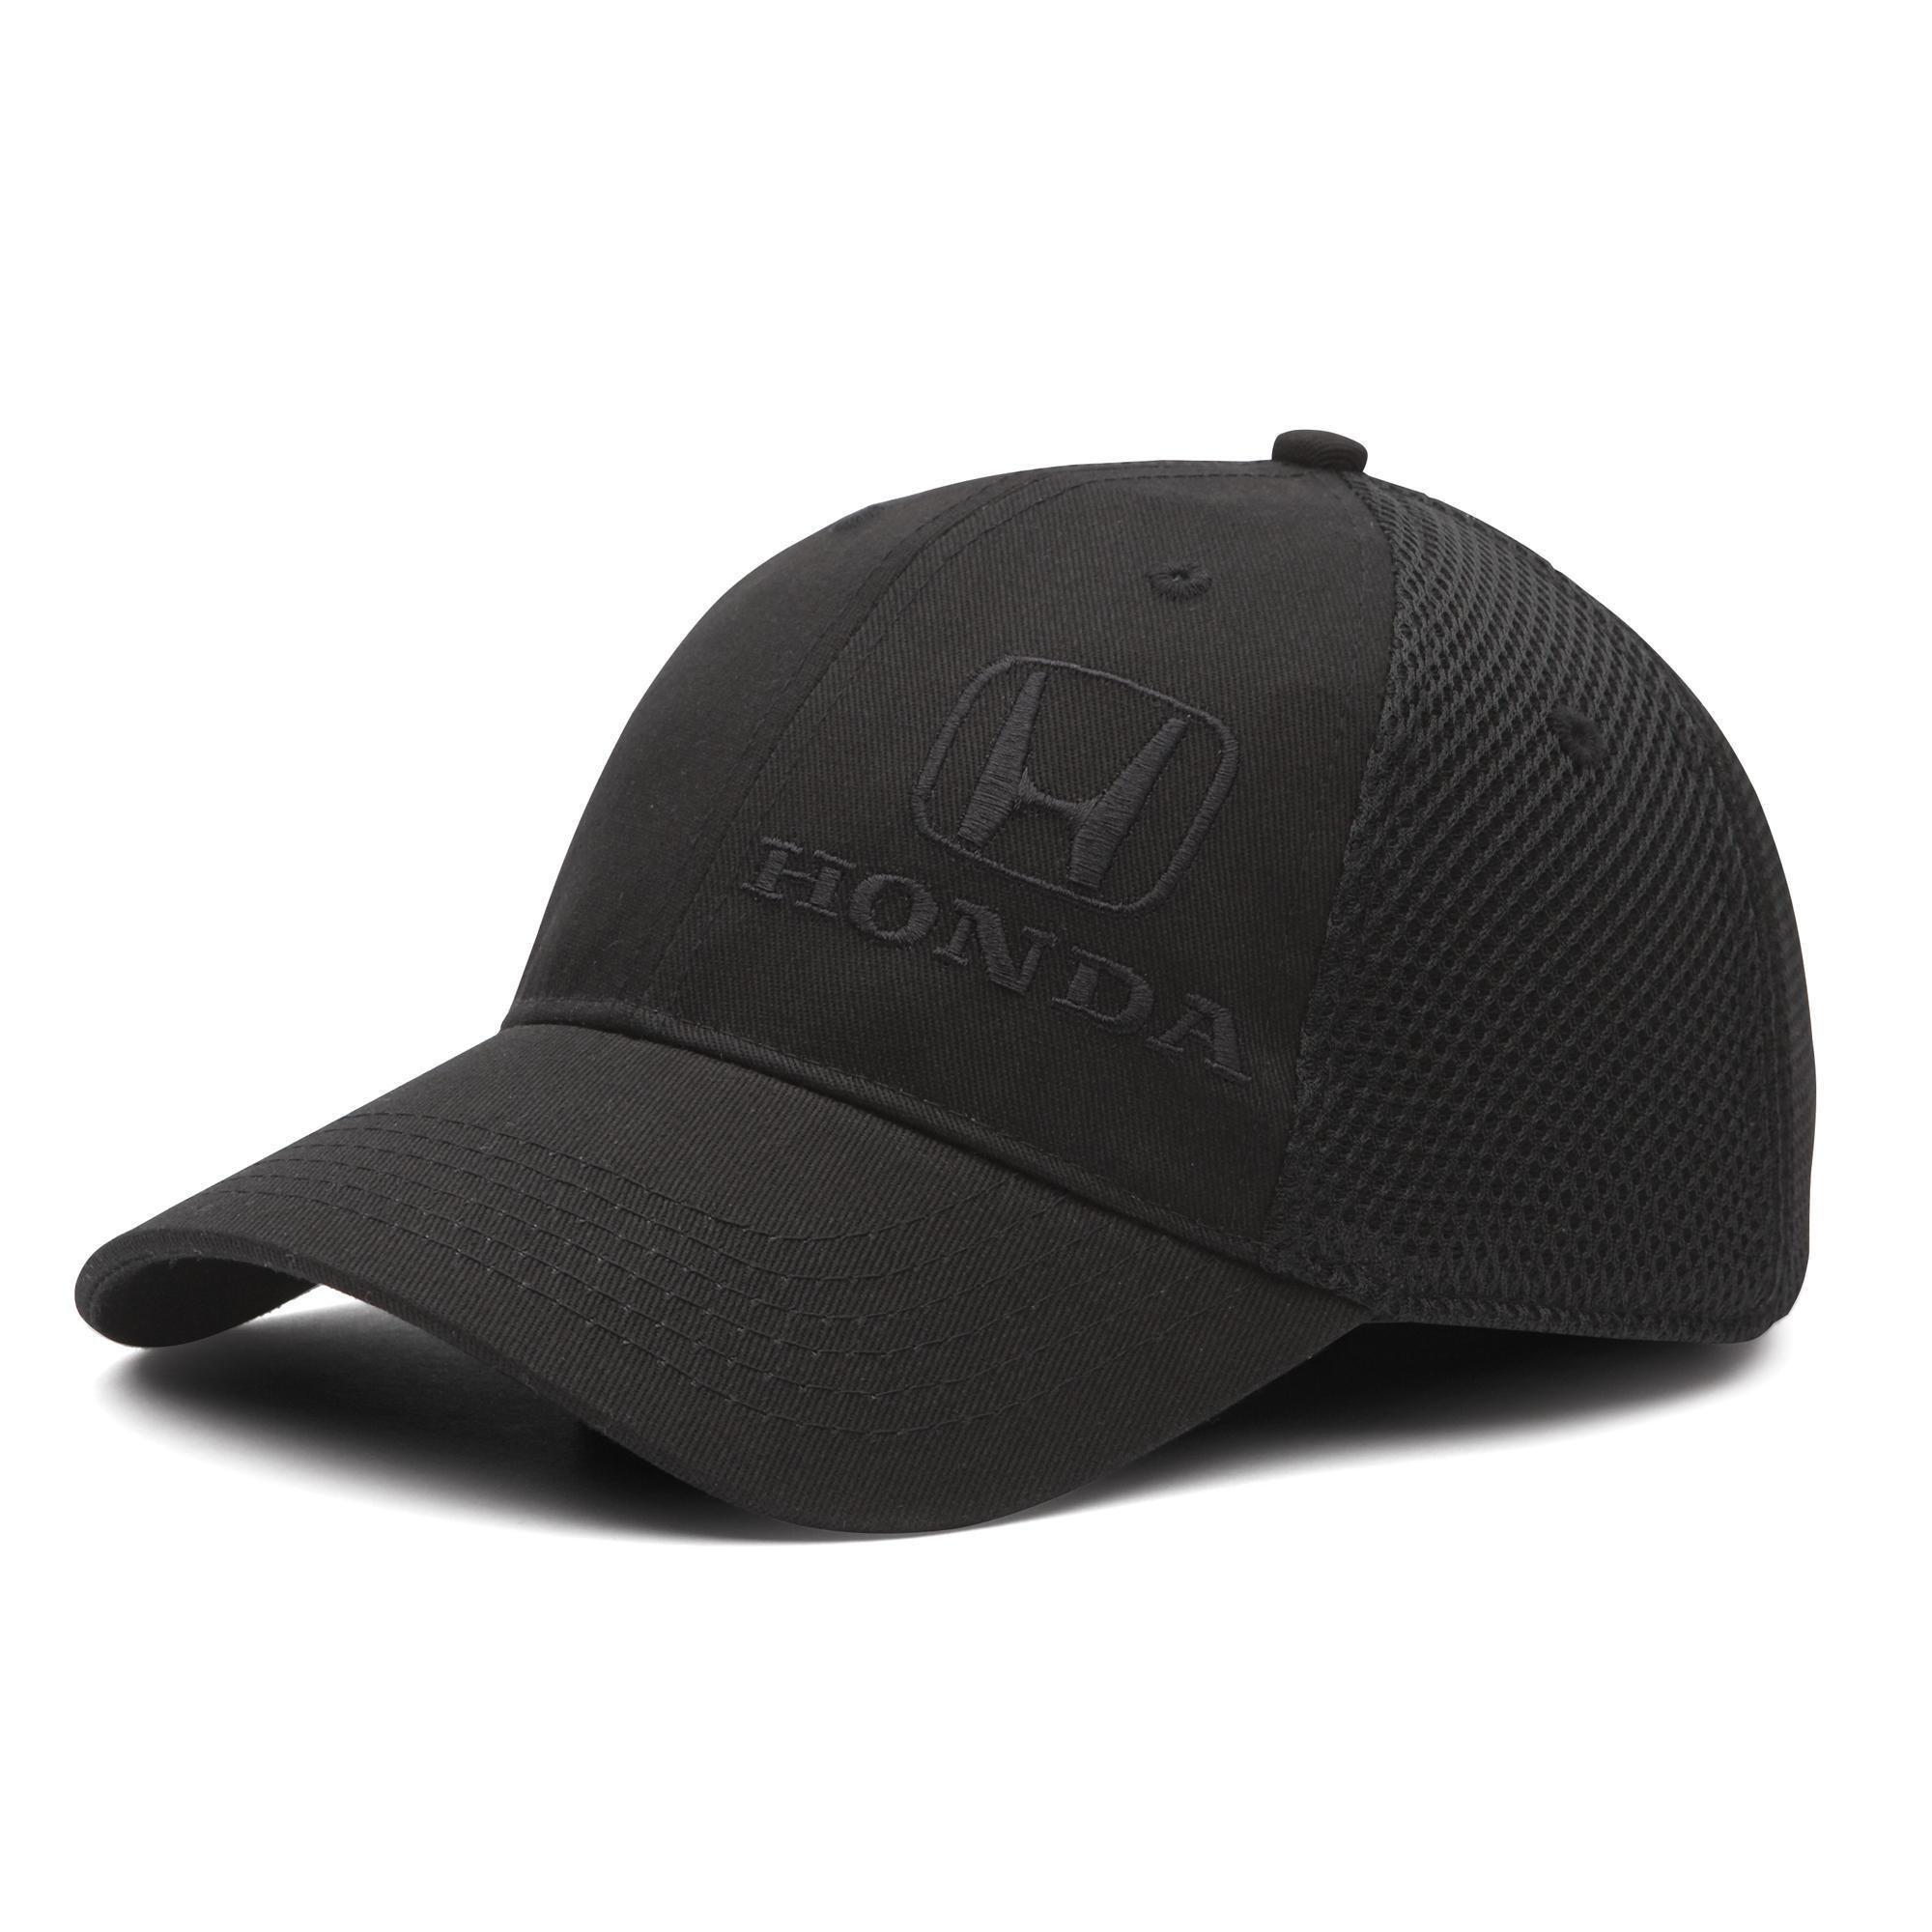 TONE-ON-TONE CAP